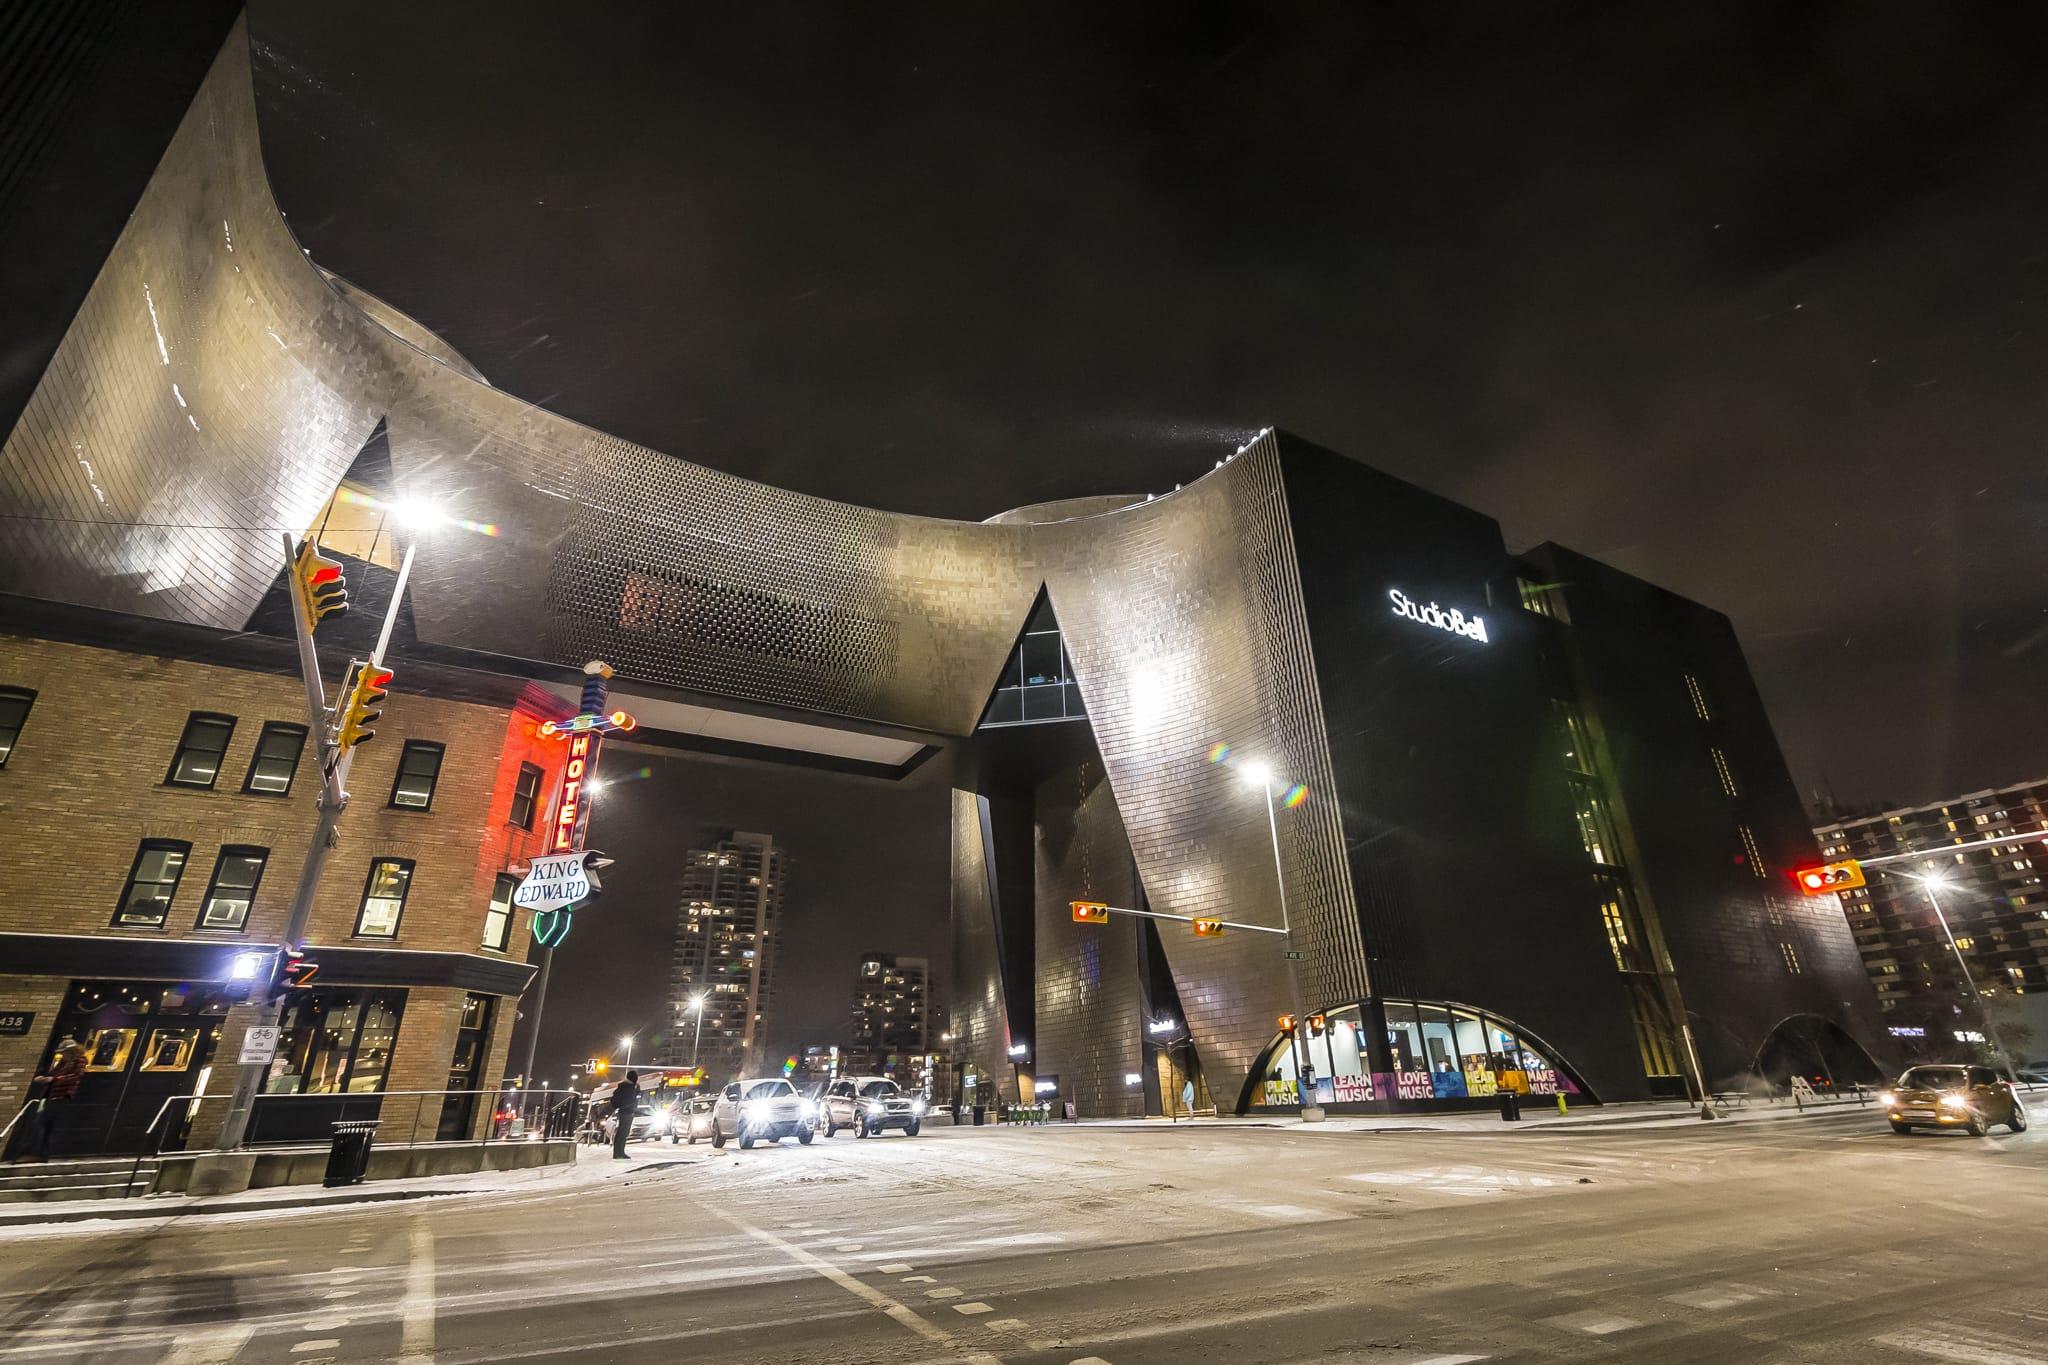 Studio Bell, Photo by Concert Socks